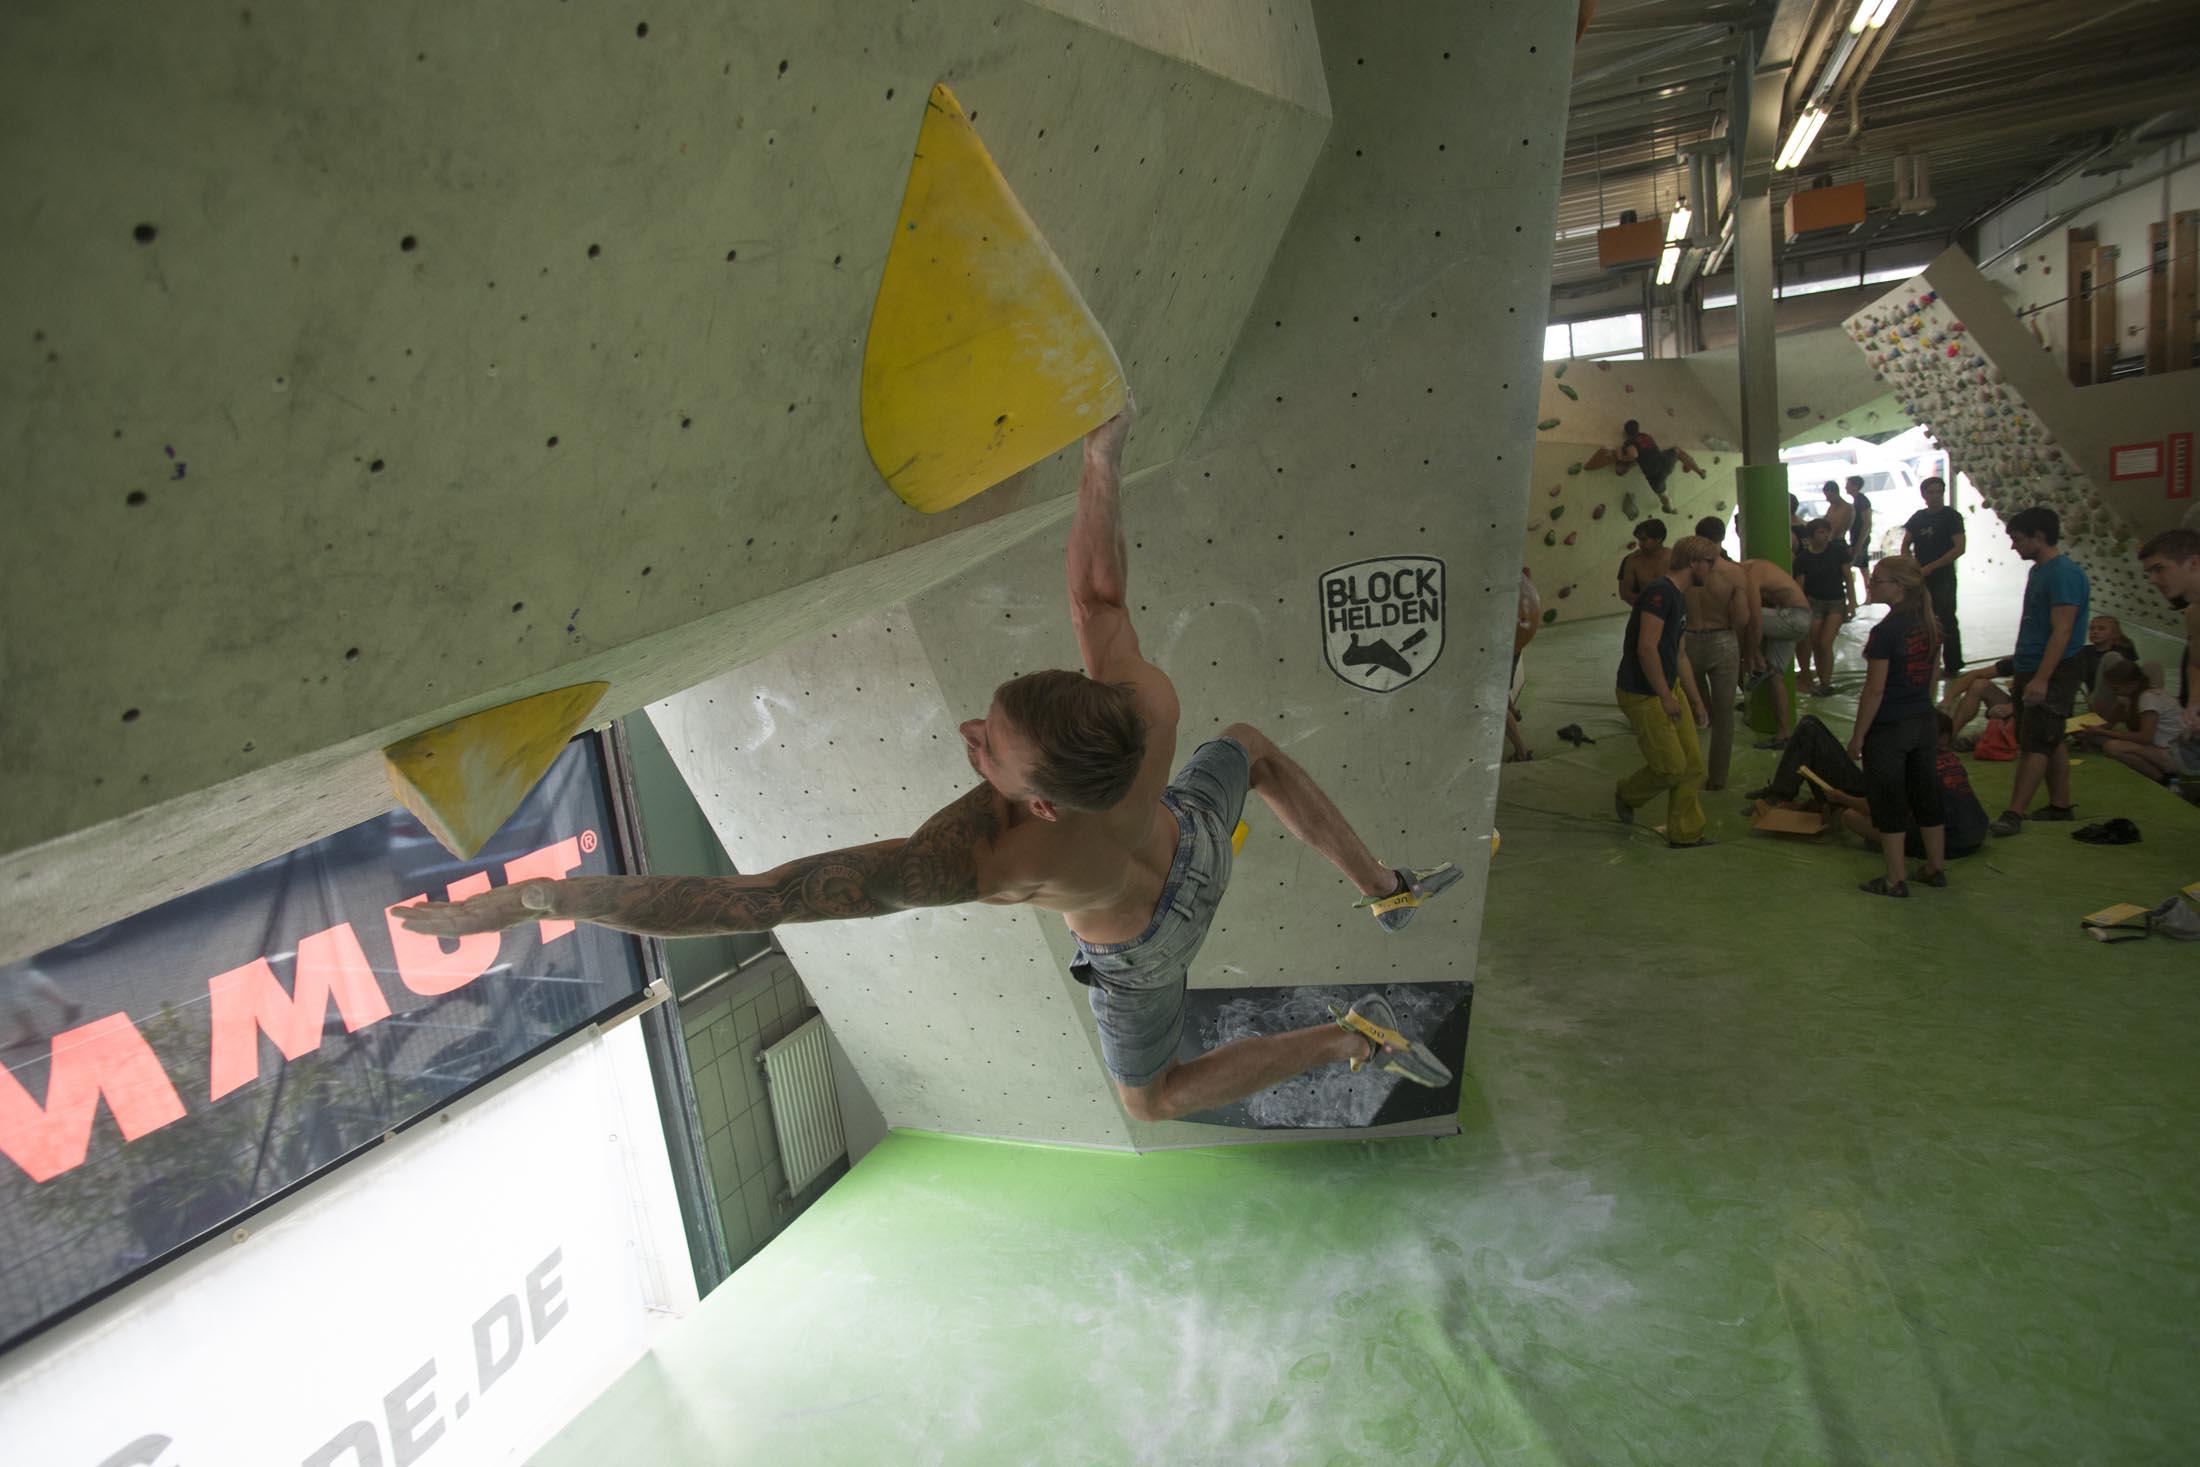 Quali, internationaler bouldercup Frankenjura 2016, BLOCKHELDEN Erlangen, Mammut, Bergfreunde.de, Boulderwettkampf07092016366